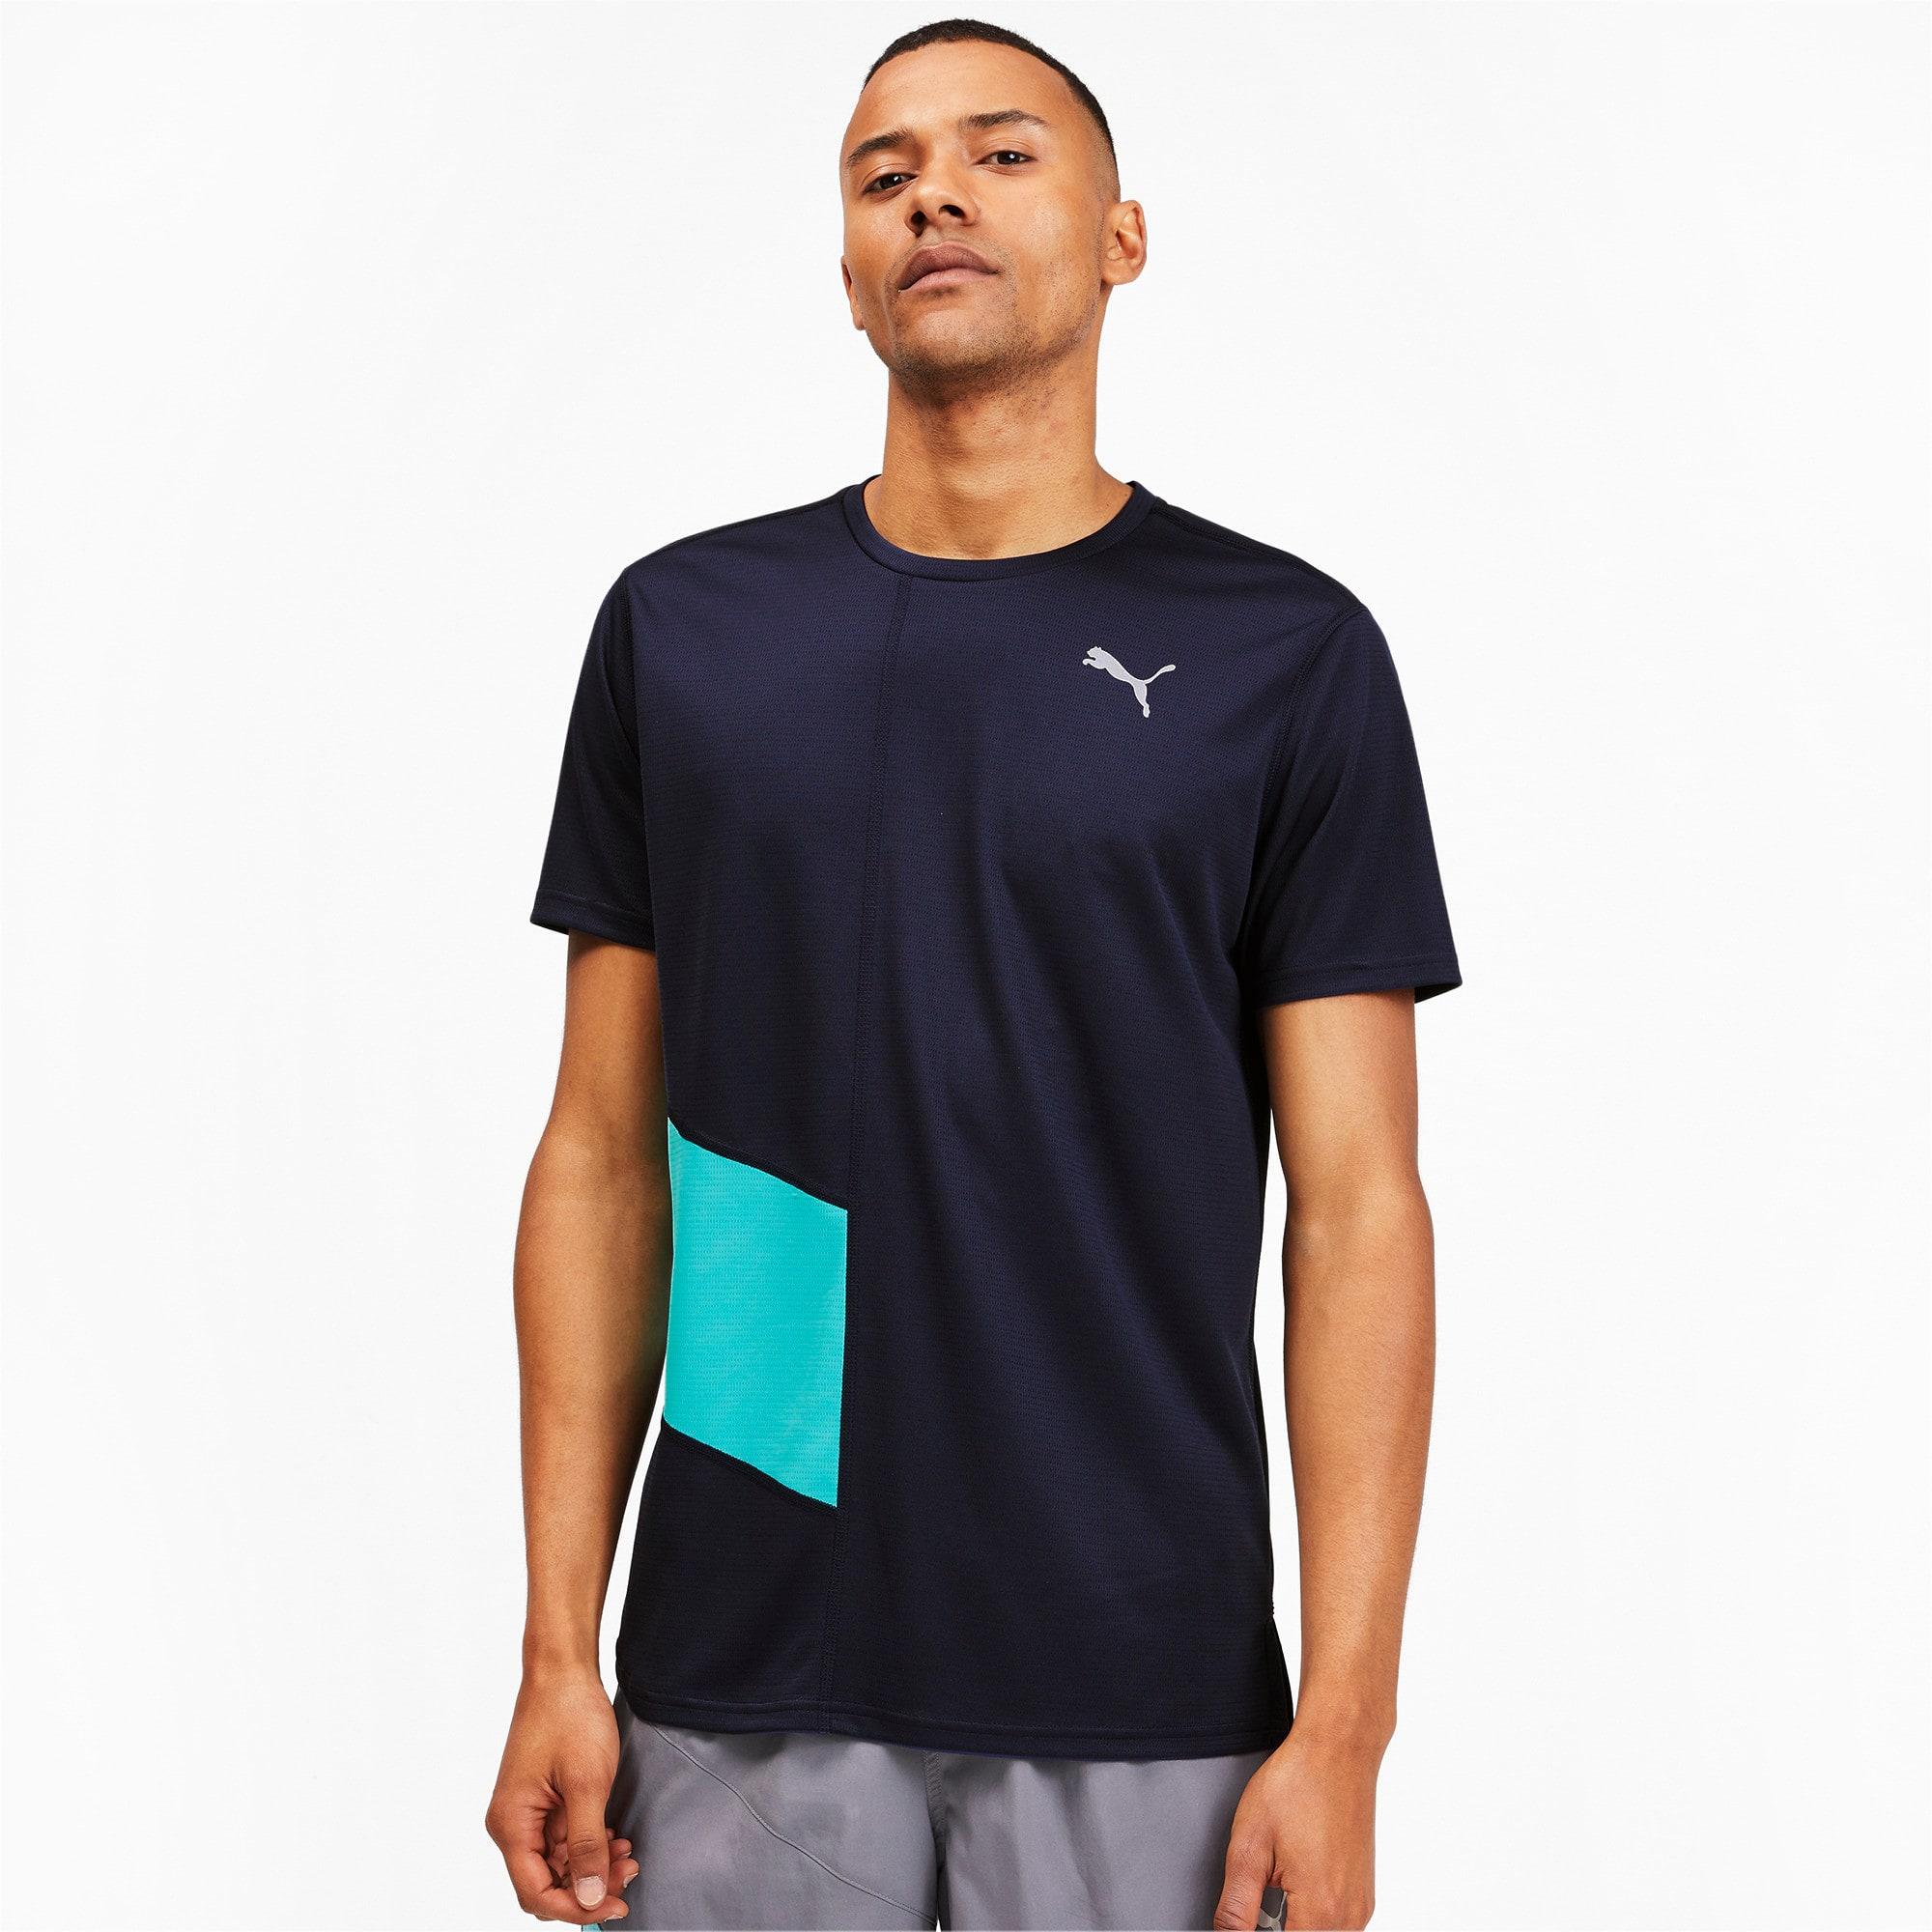 Thumbnail 1 van IGNITE hardloopshirt voor mannen, Peacoat-blauwturquoise, medium